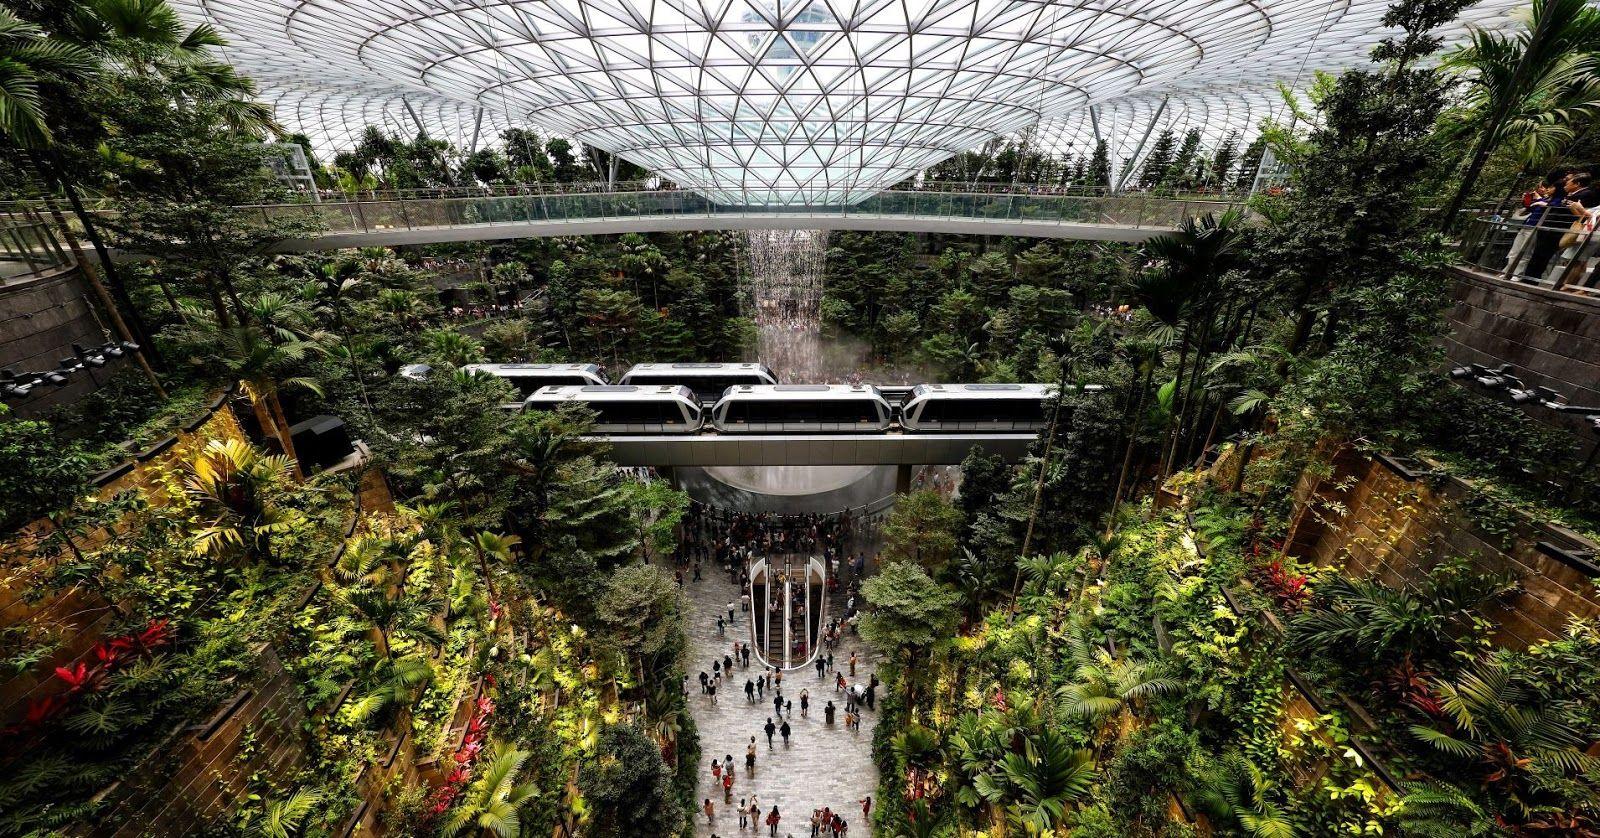 Singapore Changi Airport S New 1 3 Billion Lifestyle Hub